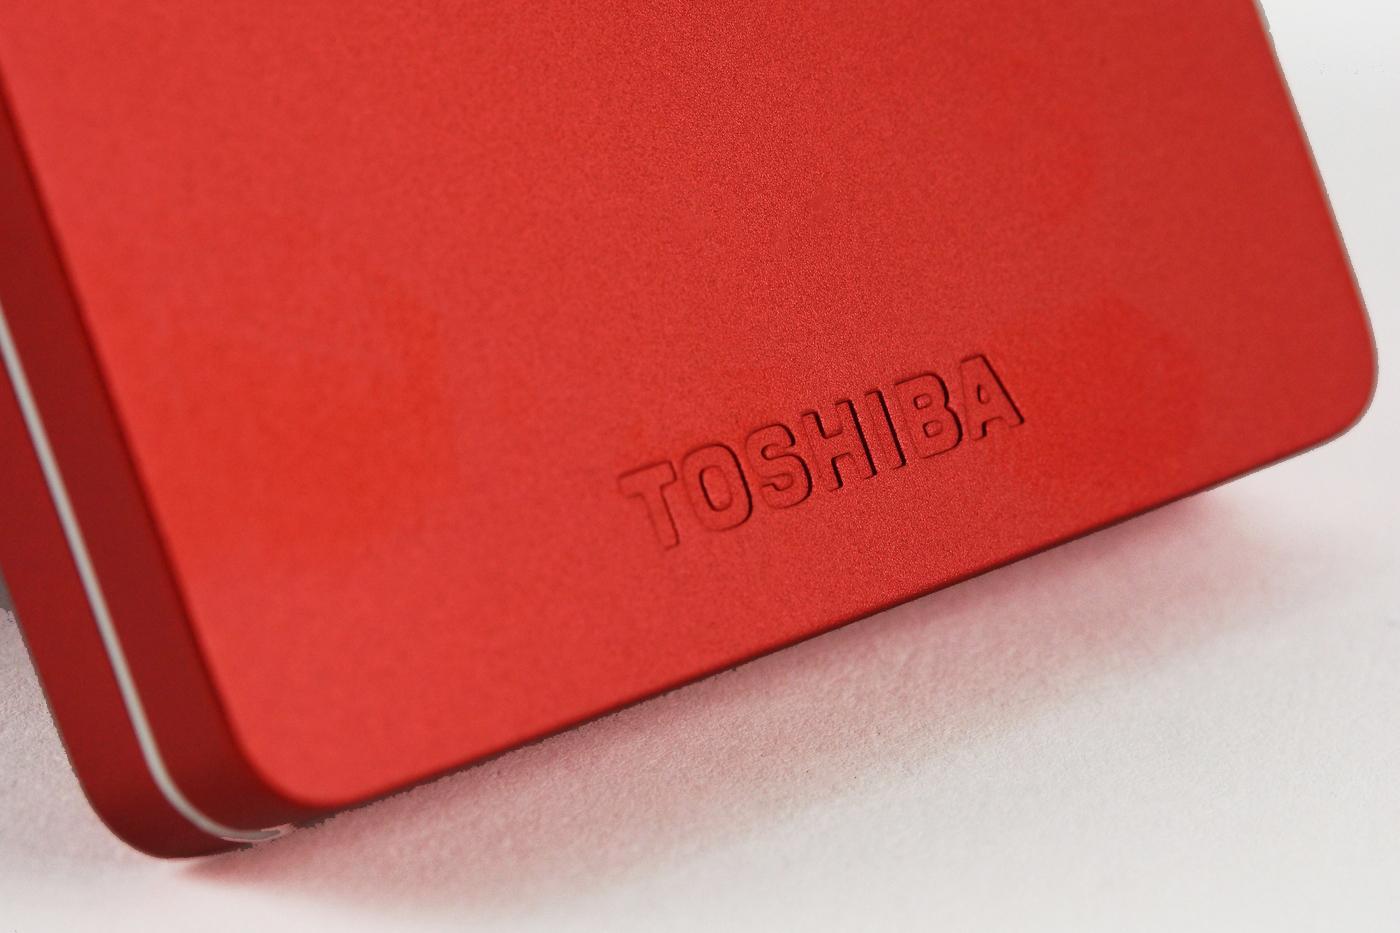 Toshiba Canvio Alumy Usb30 External End 11 6 2019 816 Pm Hardisk 1tb Hard Drive 2tb 3tb F